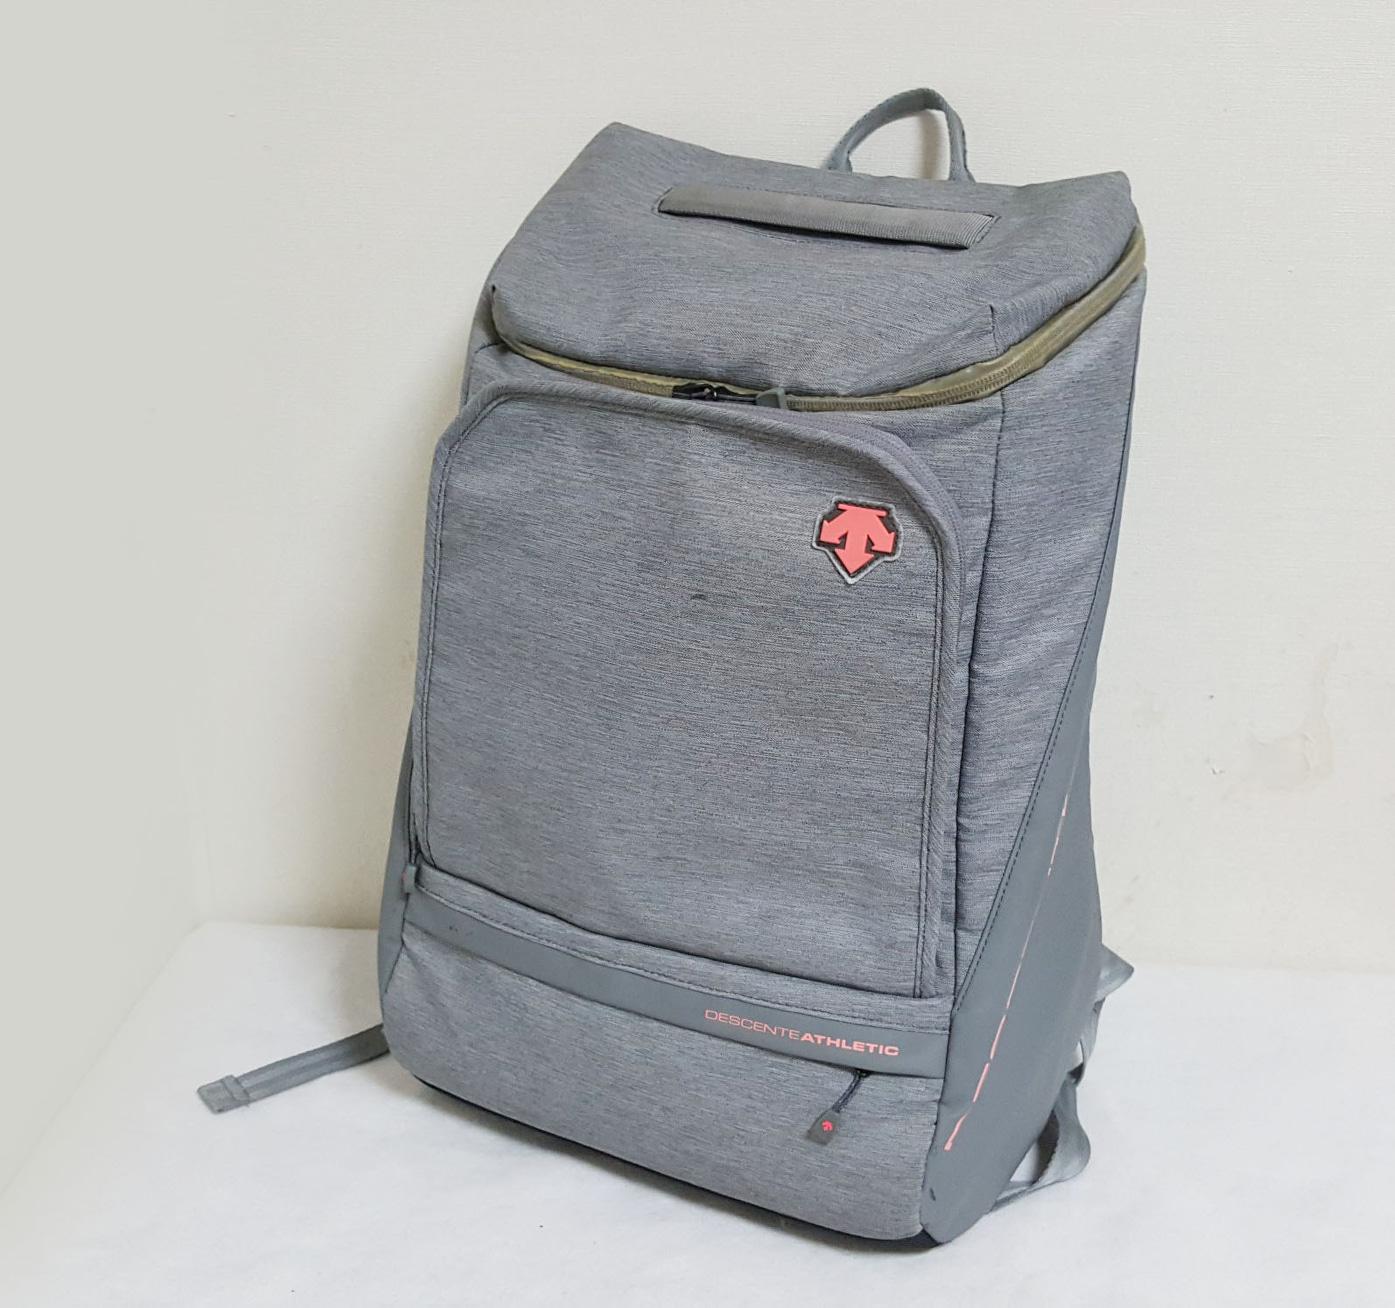 DESCENT/그레이/백팩/책가방/학교가방/데상트